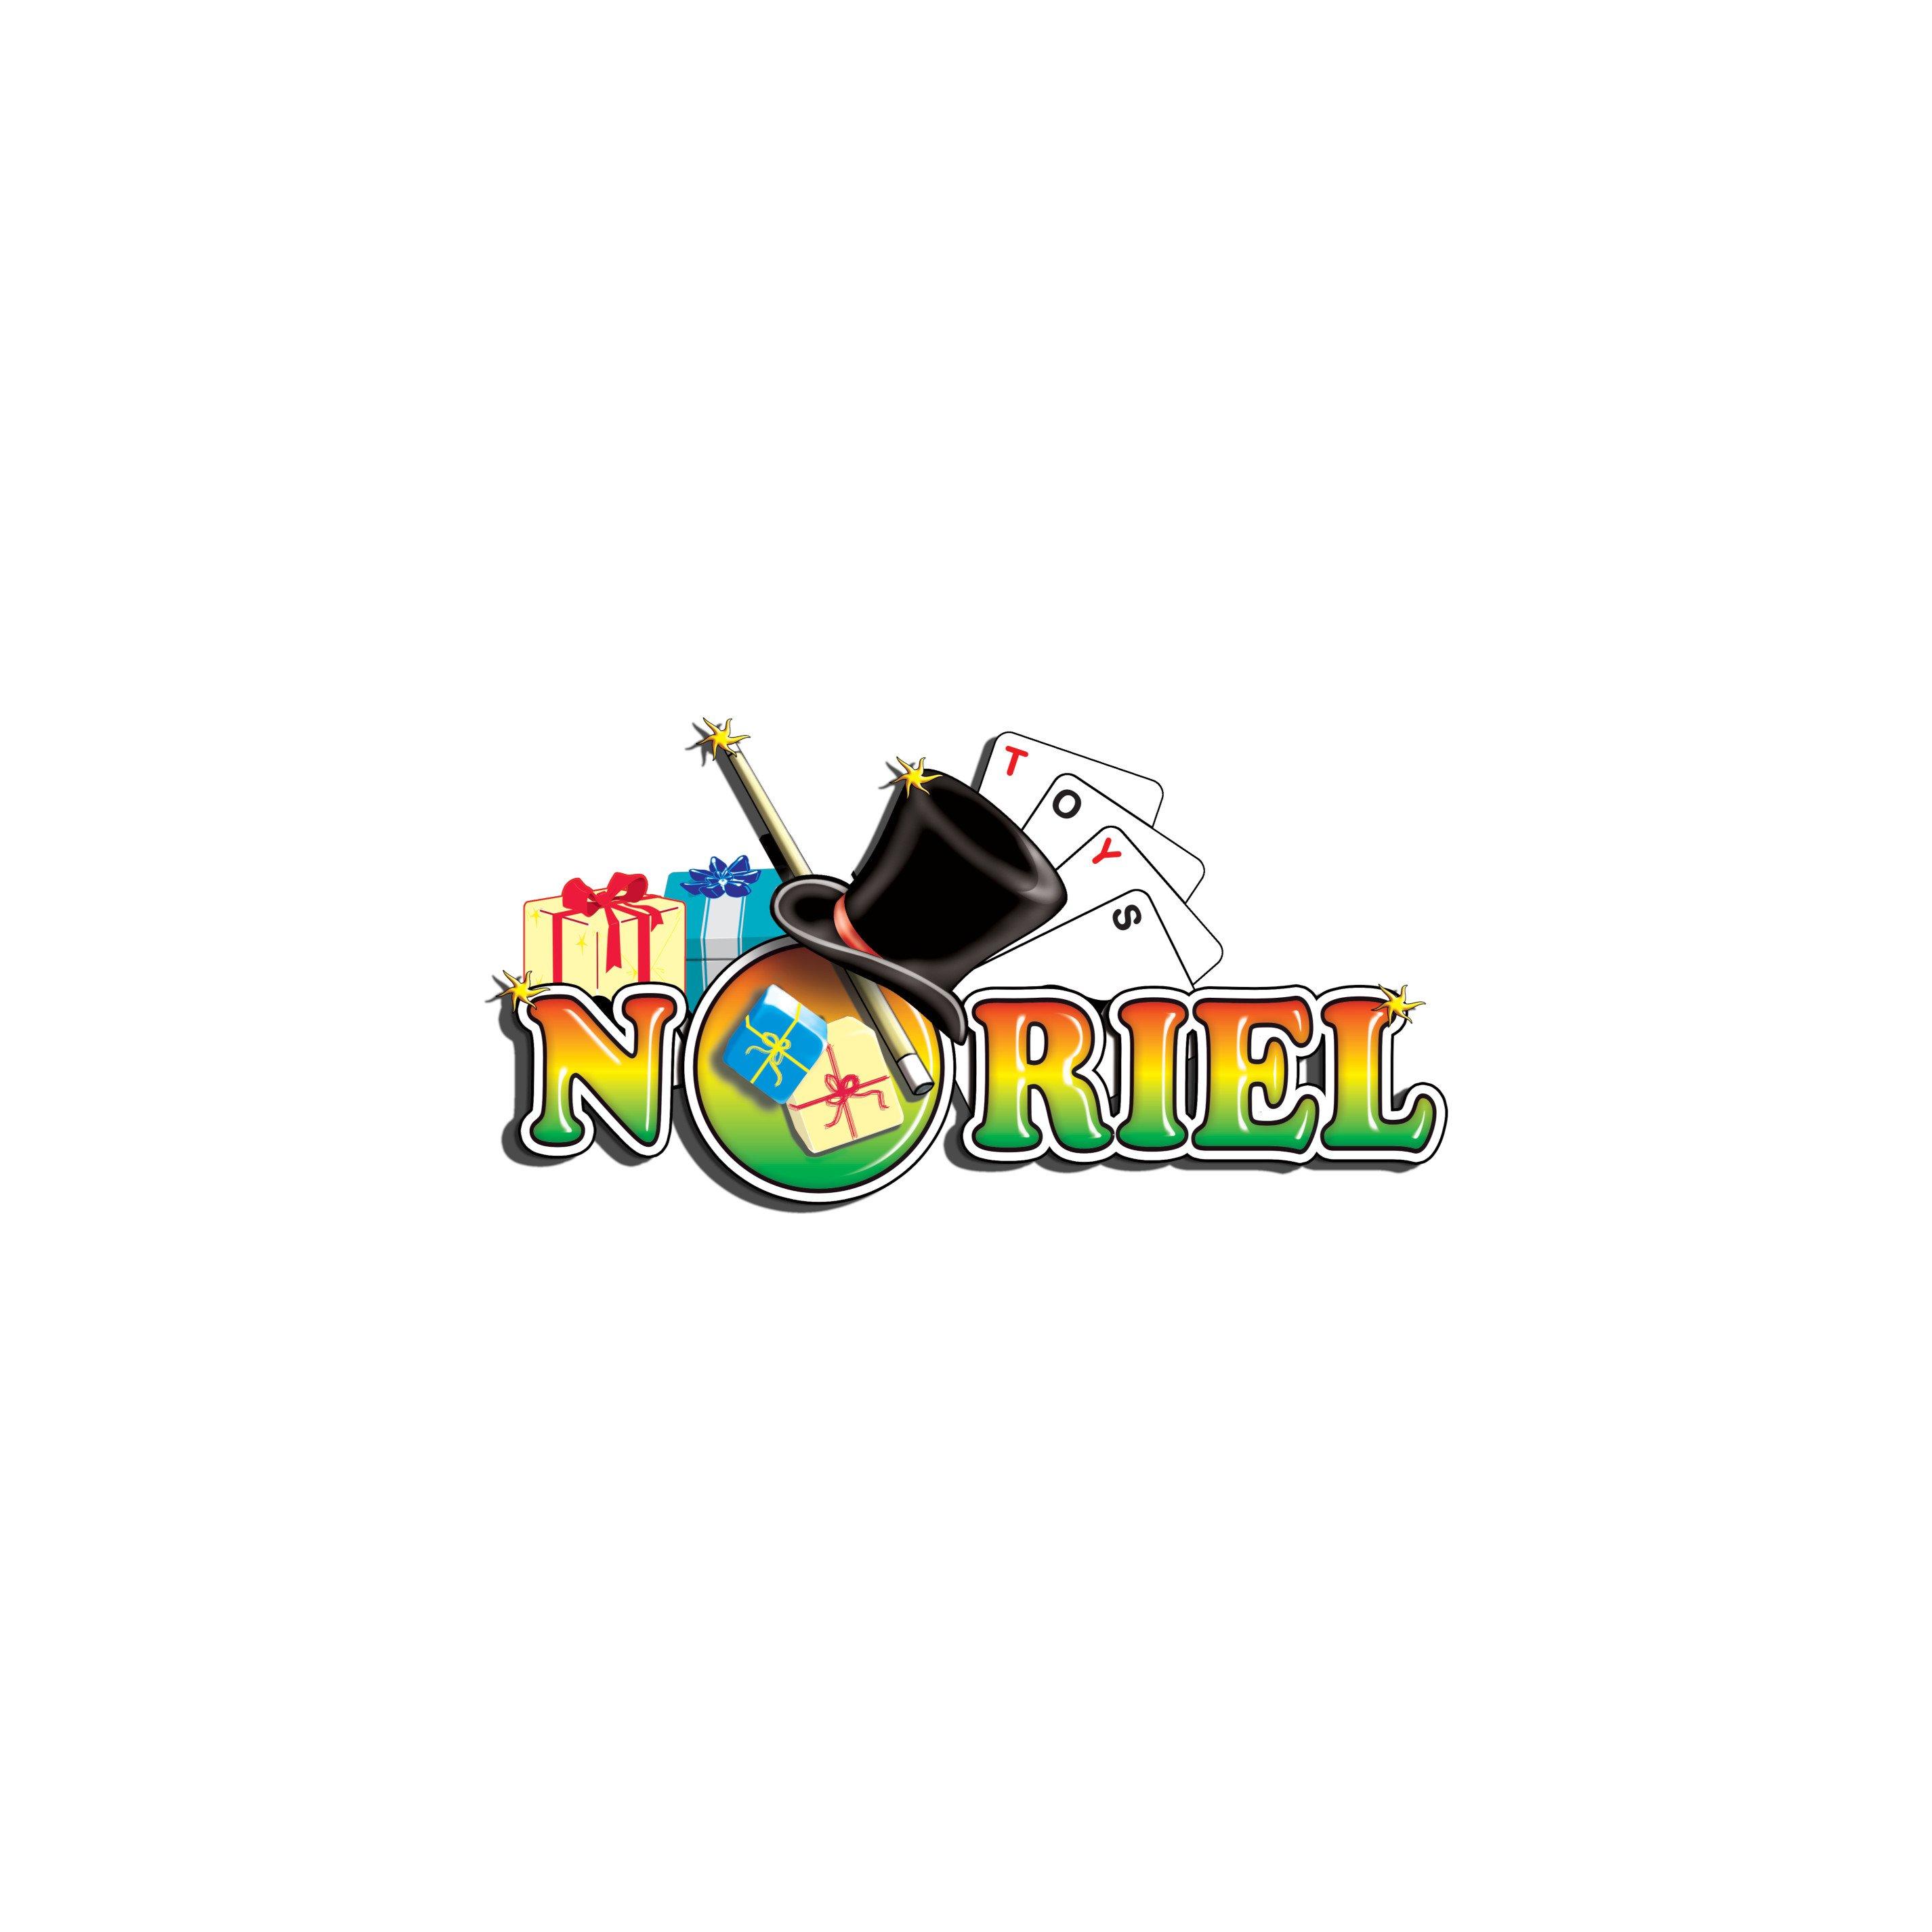 Tablita magnetica pentru desen Trolls (medie)